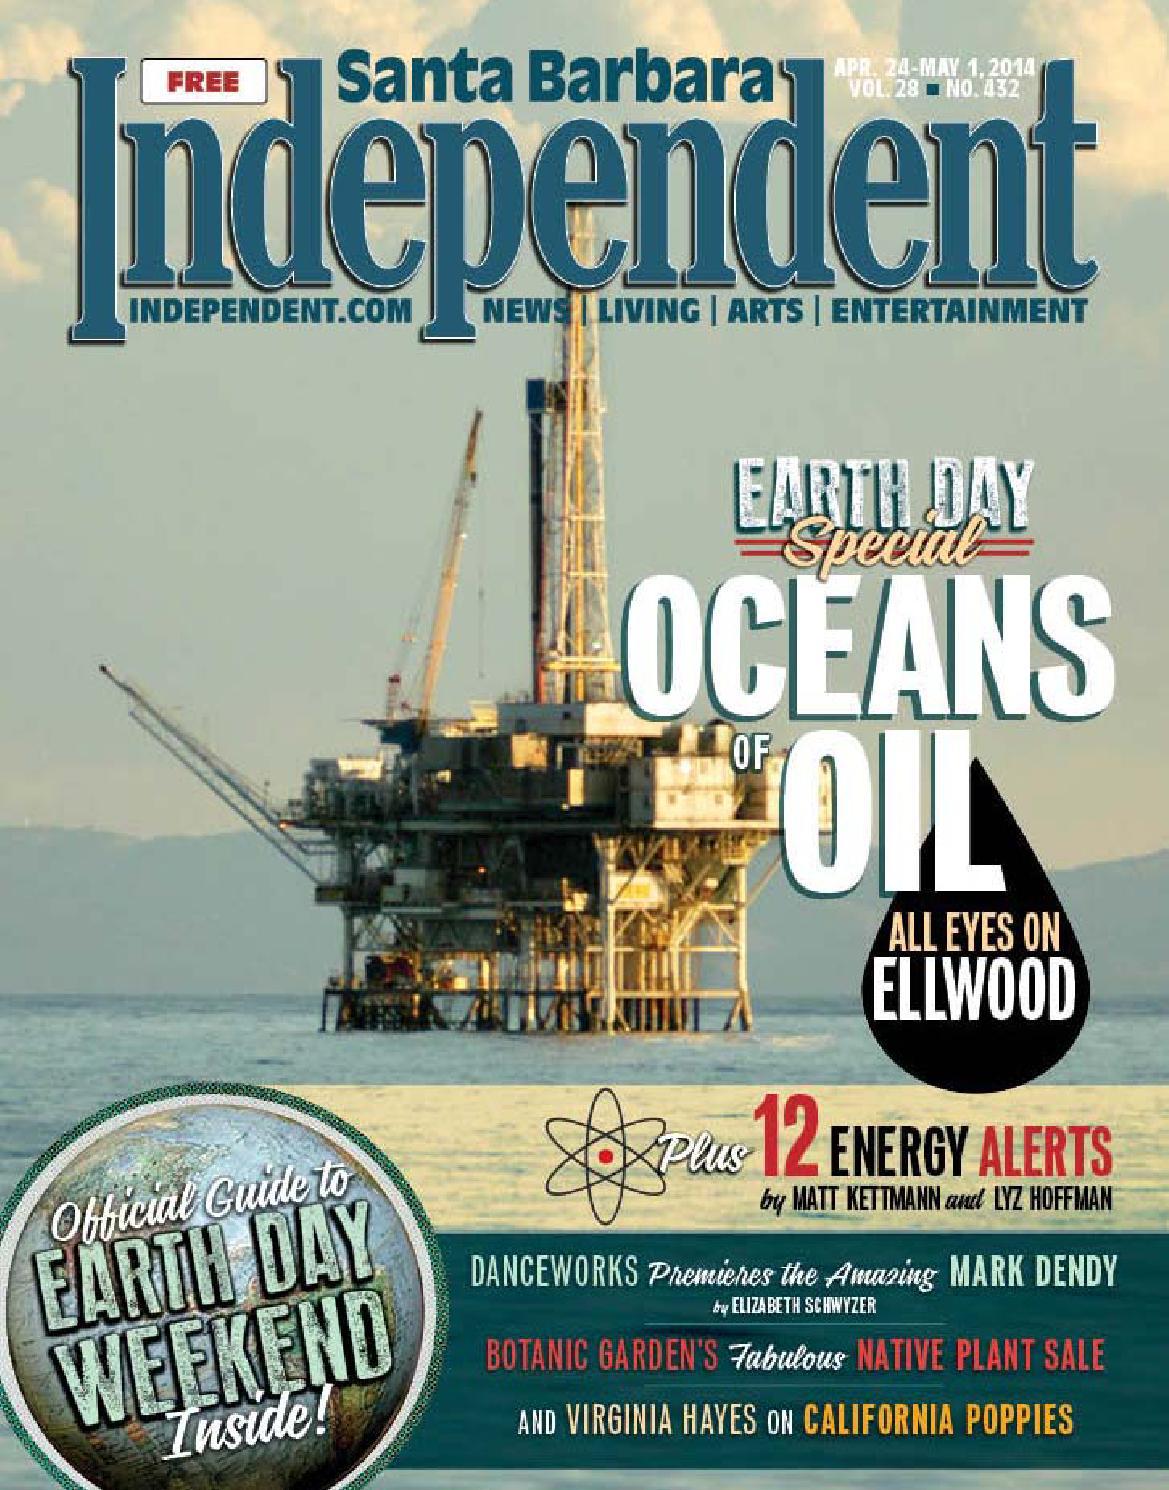 Santa Barbara Independent 04 24 14 By Sb Independent Issuu